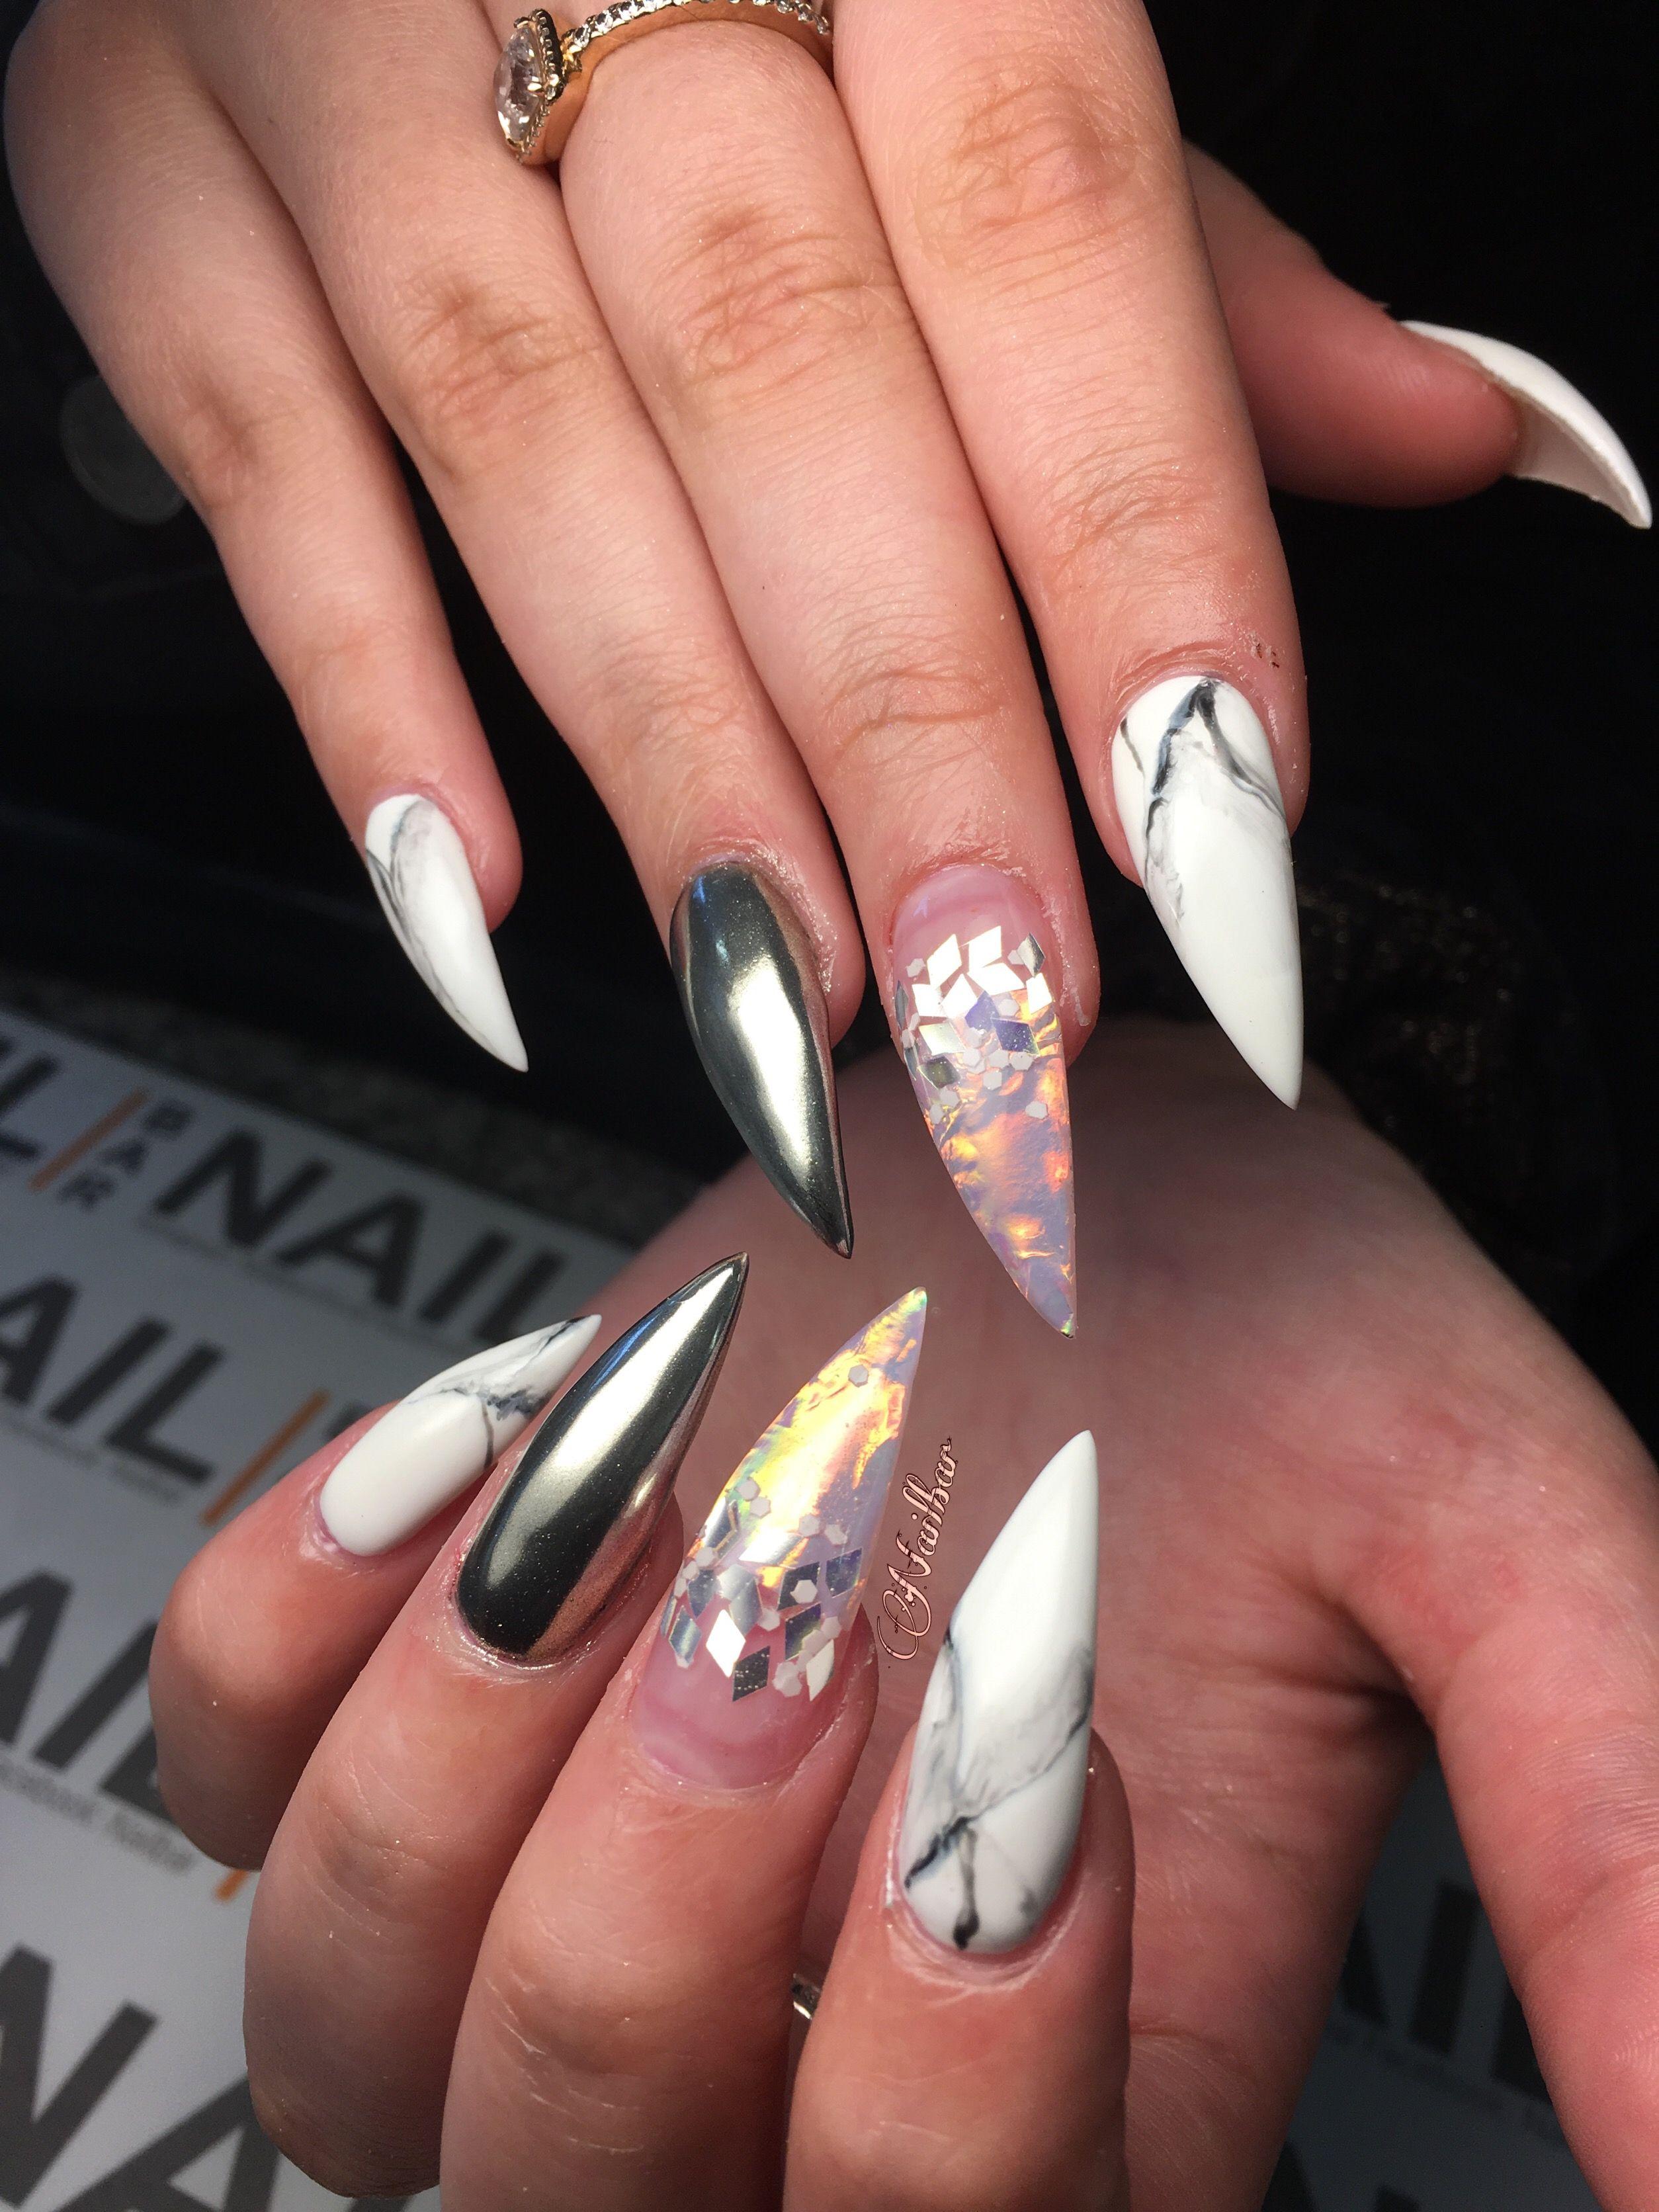 Pin by viky vázquez on uñas acrilicas pinterest gorgeous nails